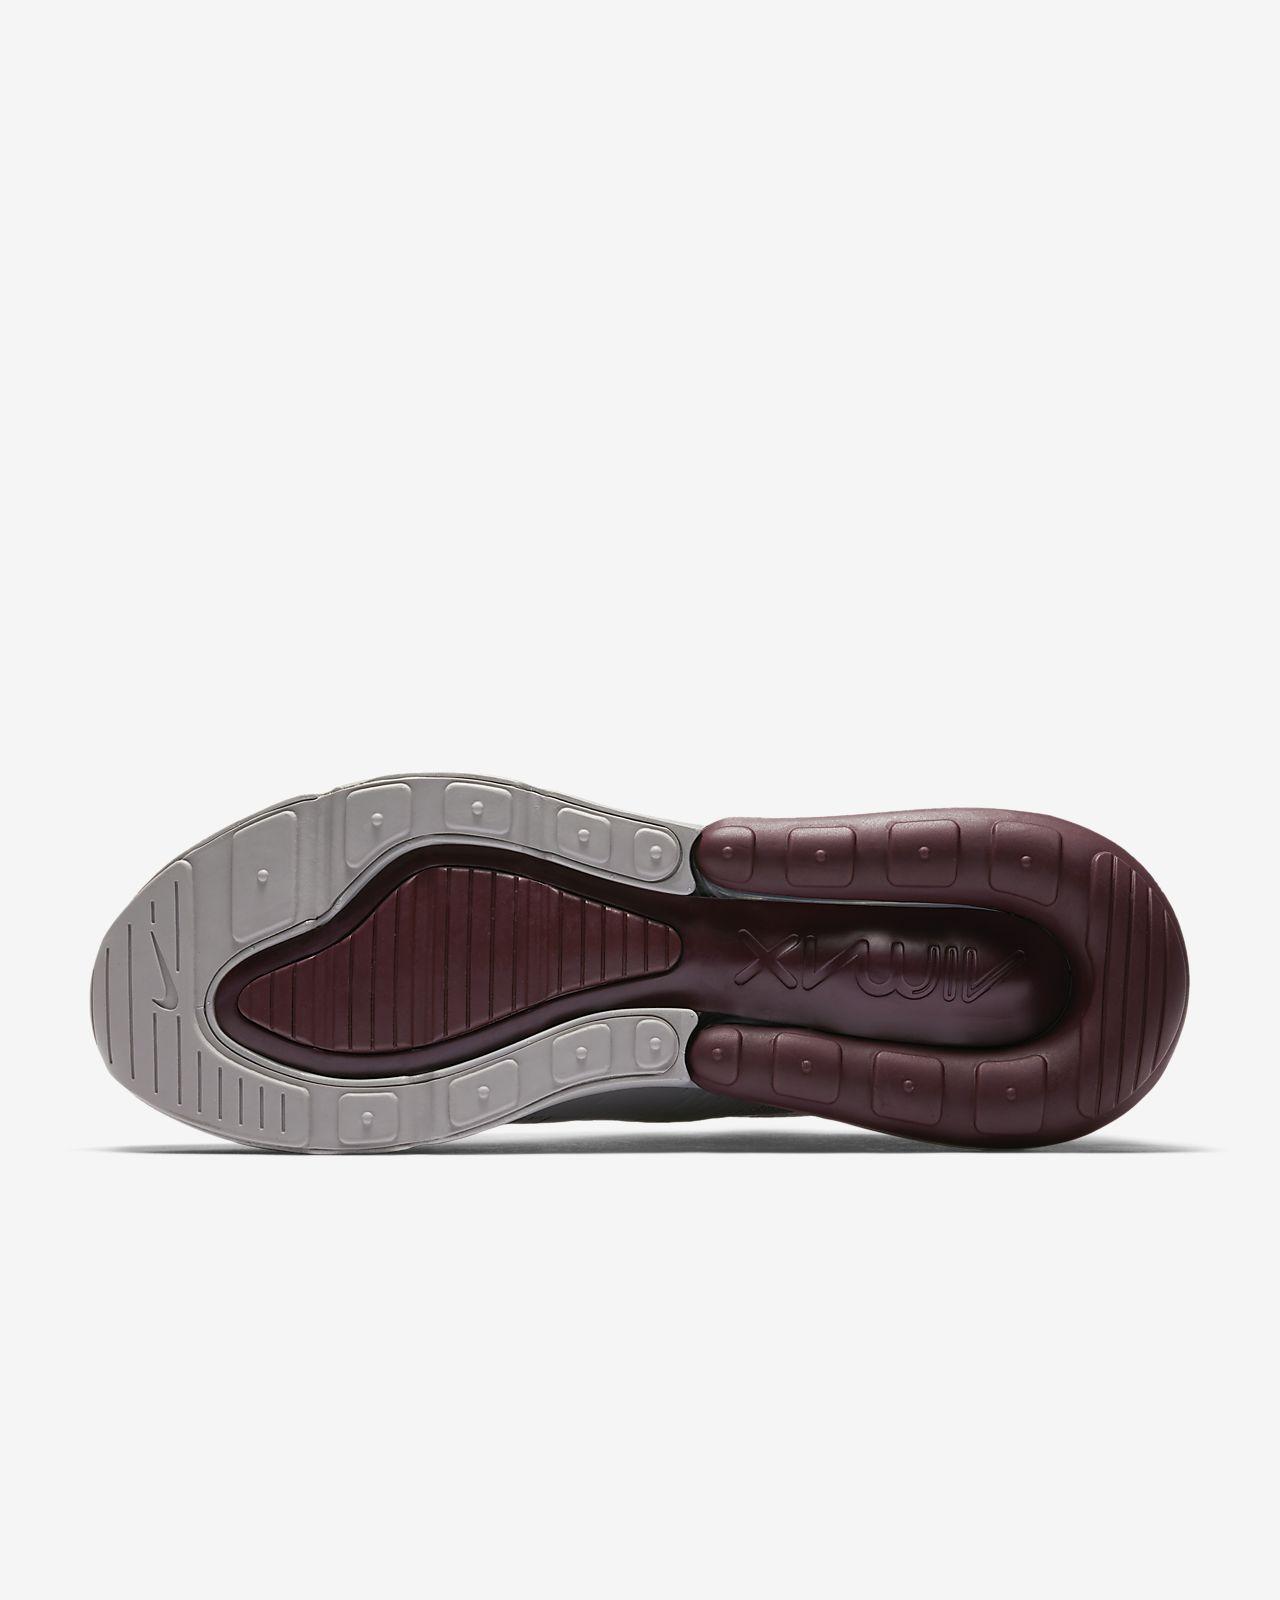 cheap for discount a3e1d d49d8 ... Chaussure Nike Air Max 270 pour Homme